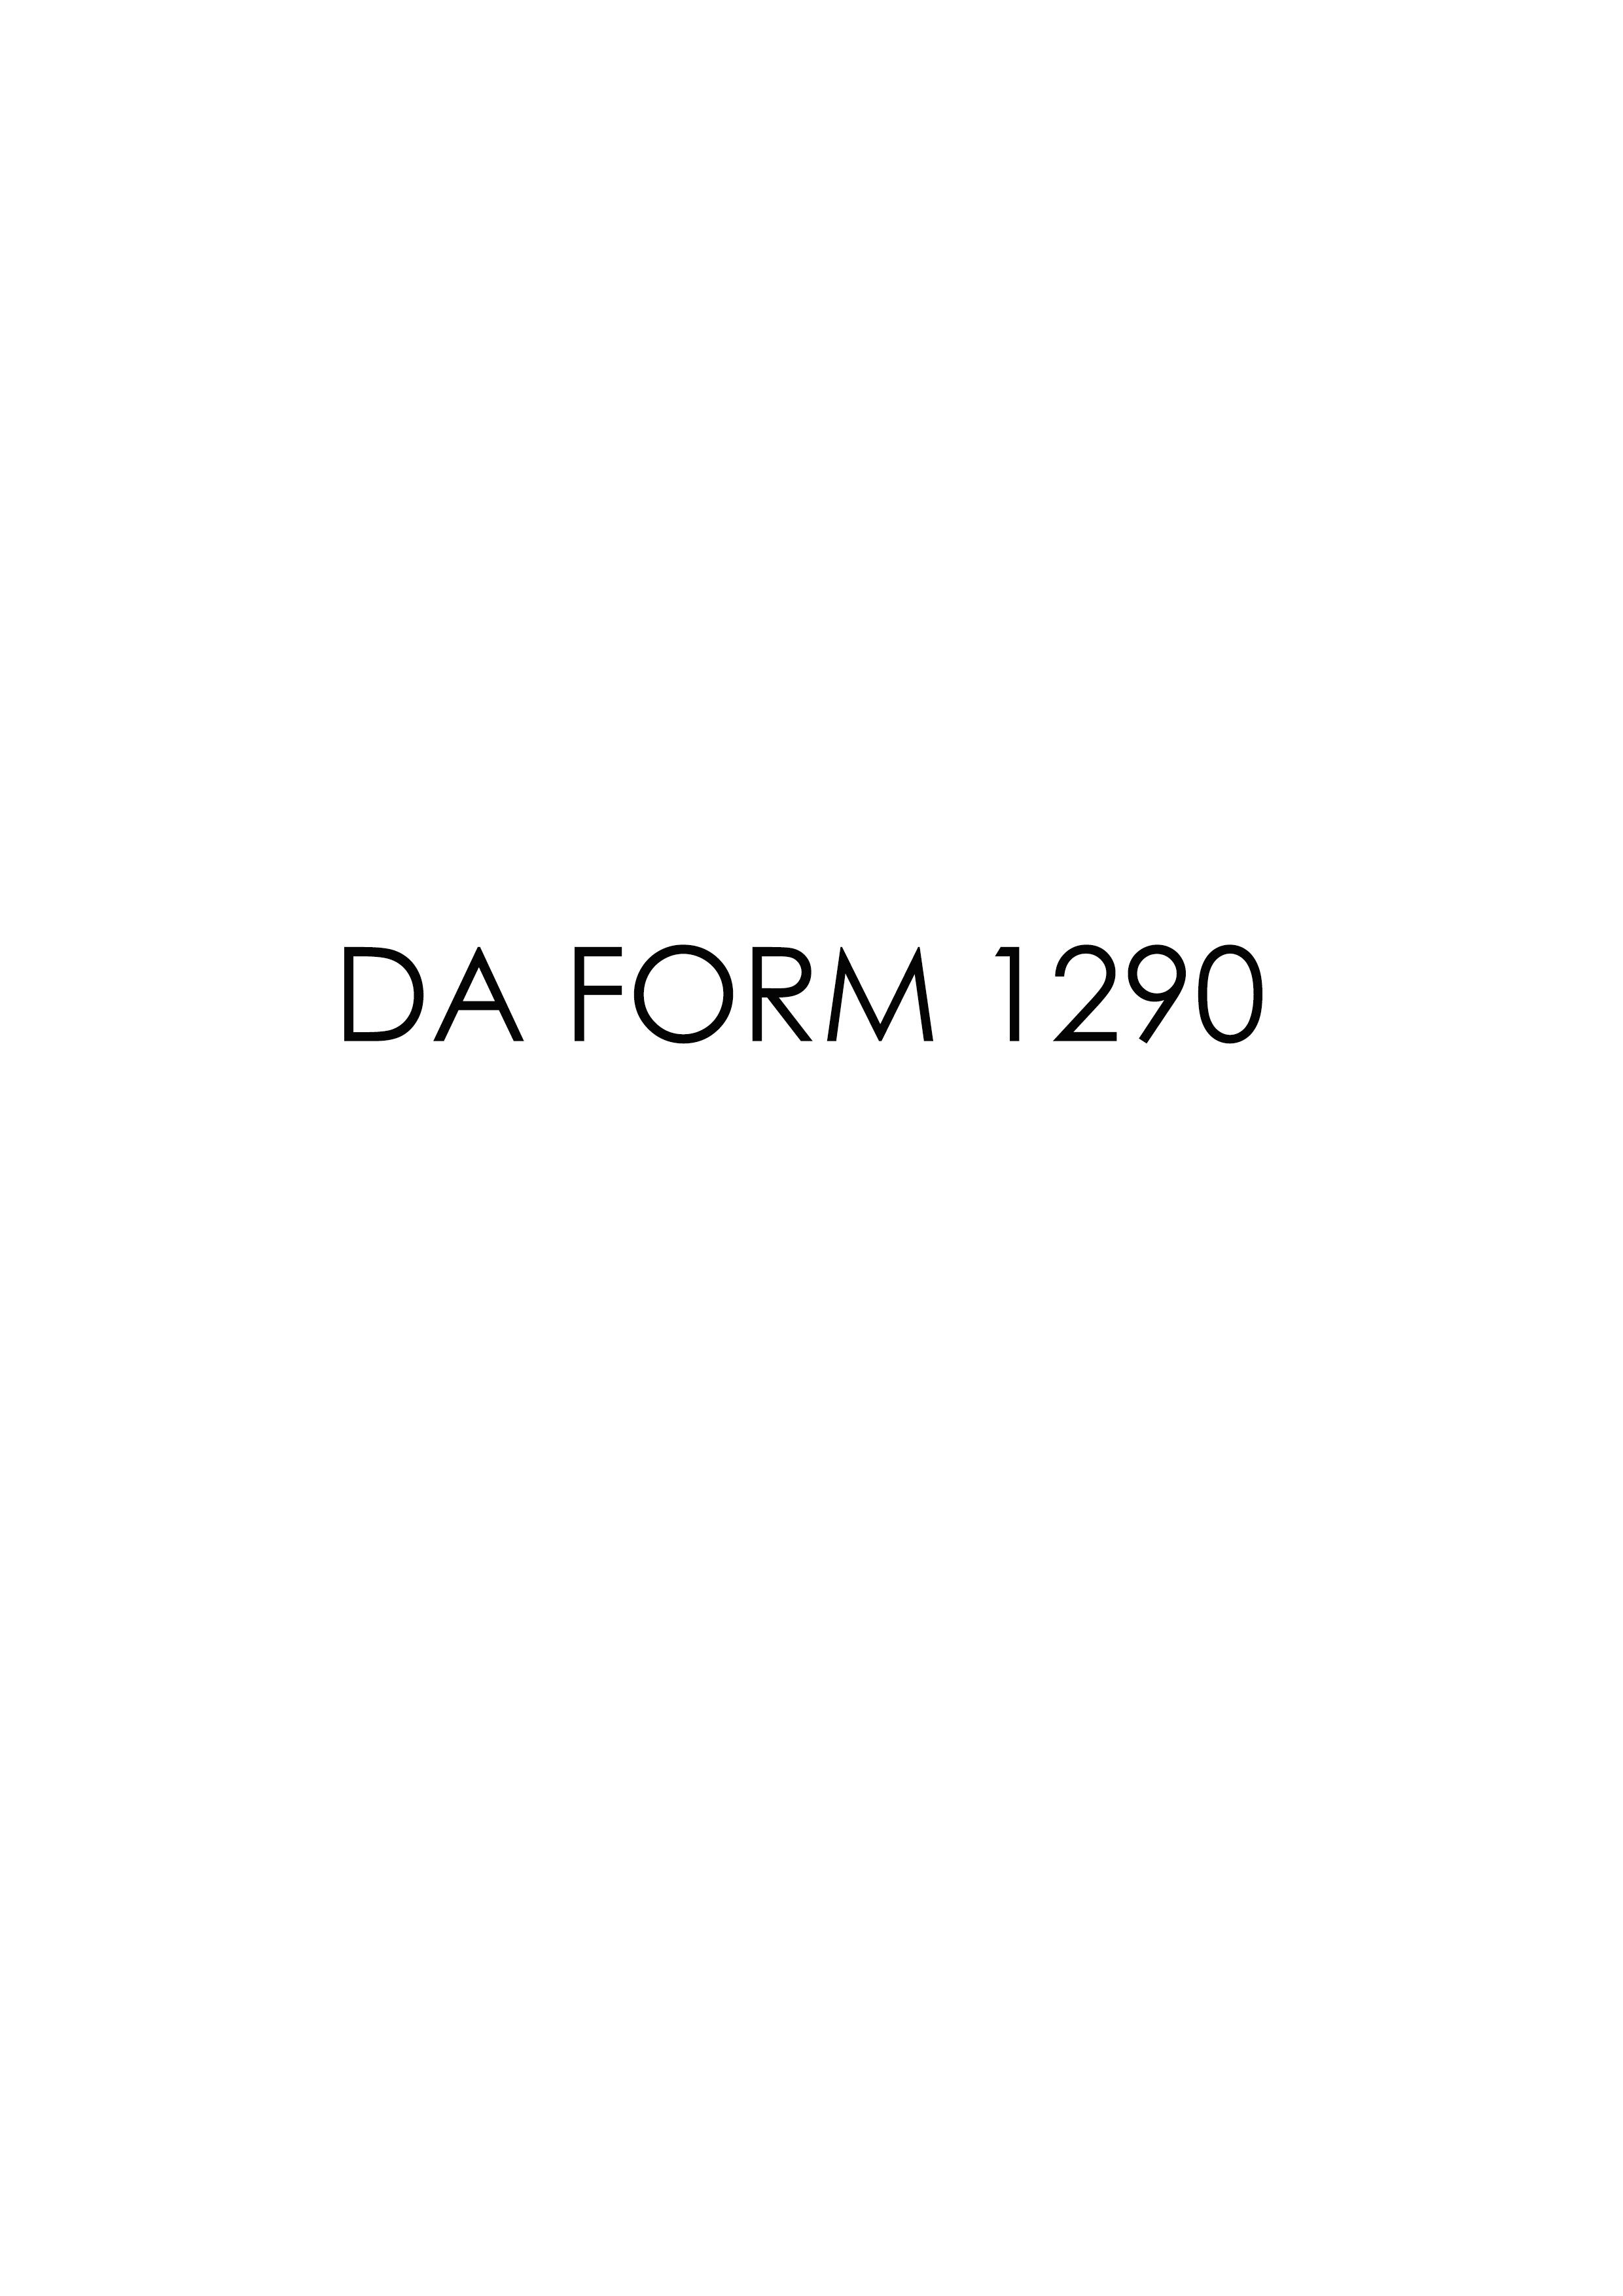 Download da Form 1290 Free